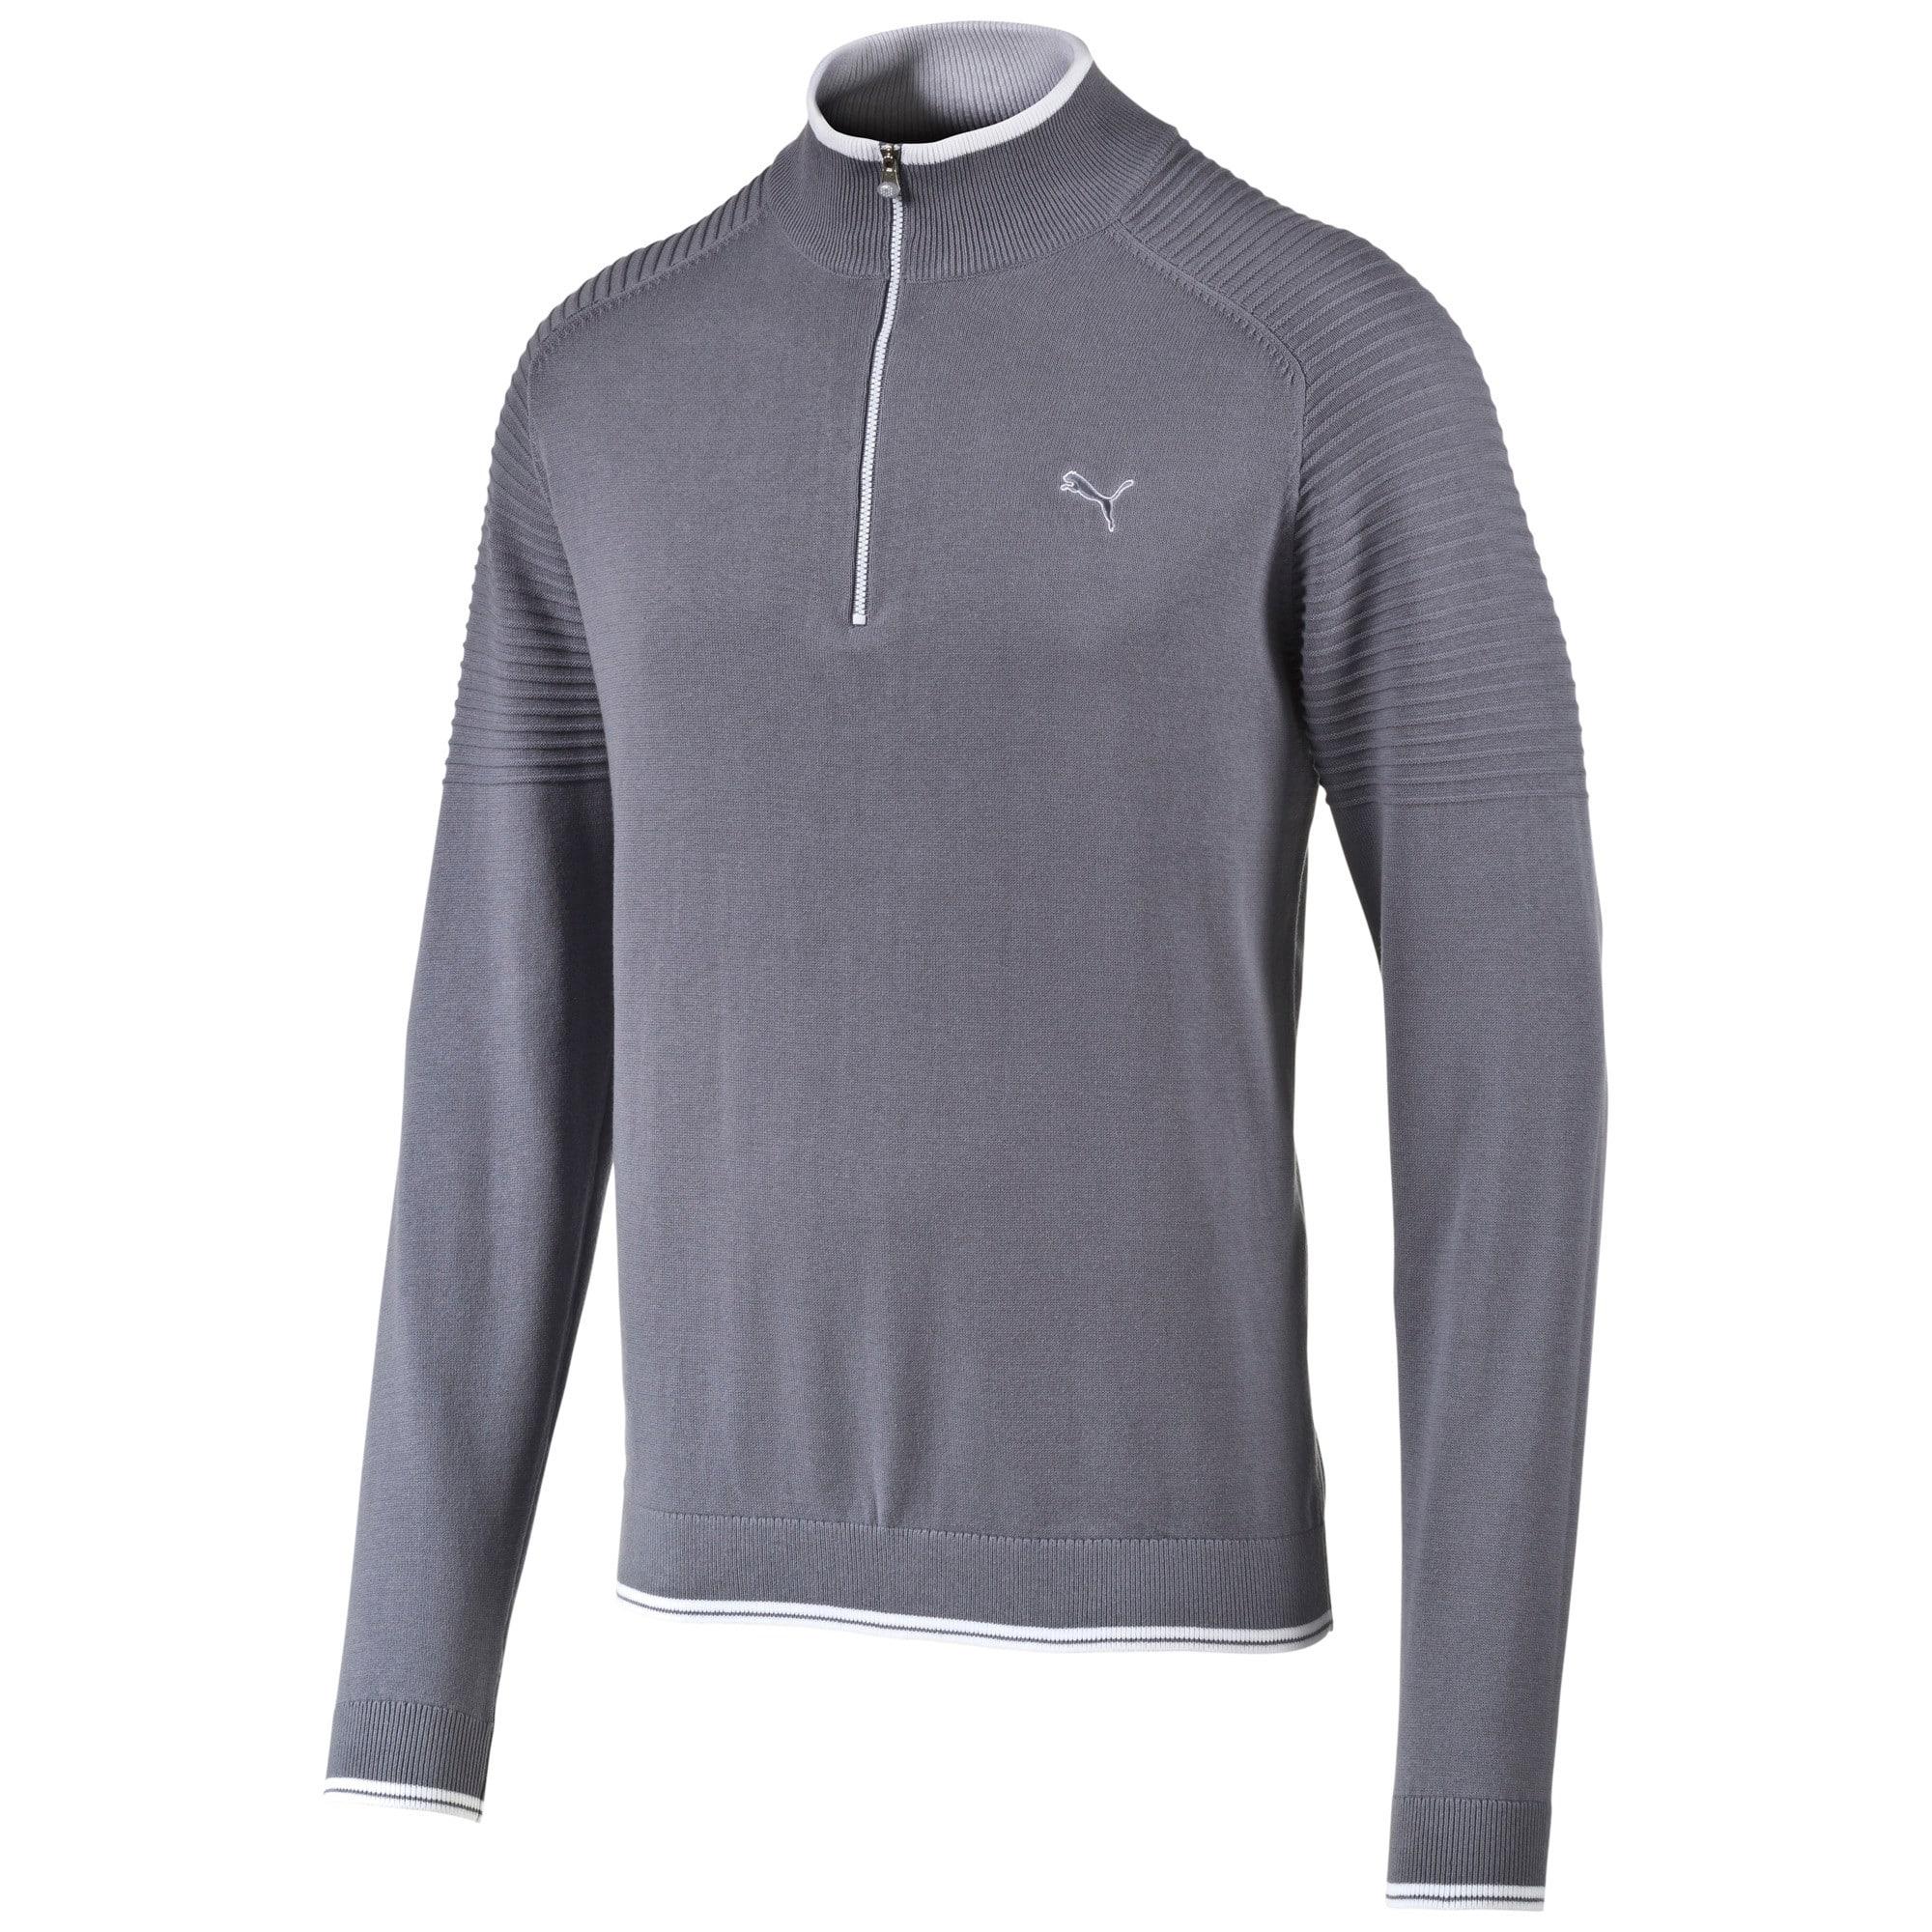 Thumbnail 1 of 1/4 Zip Sweater, folkstone gray-white, medium-IND